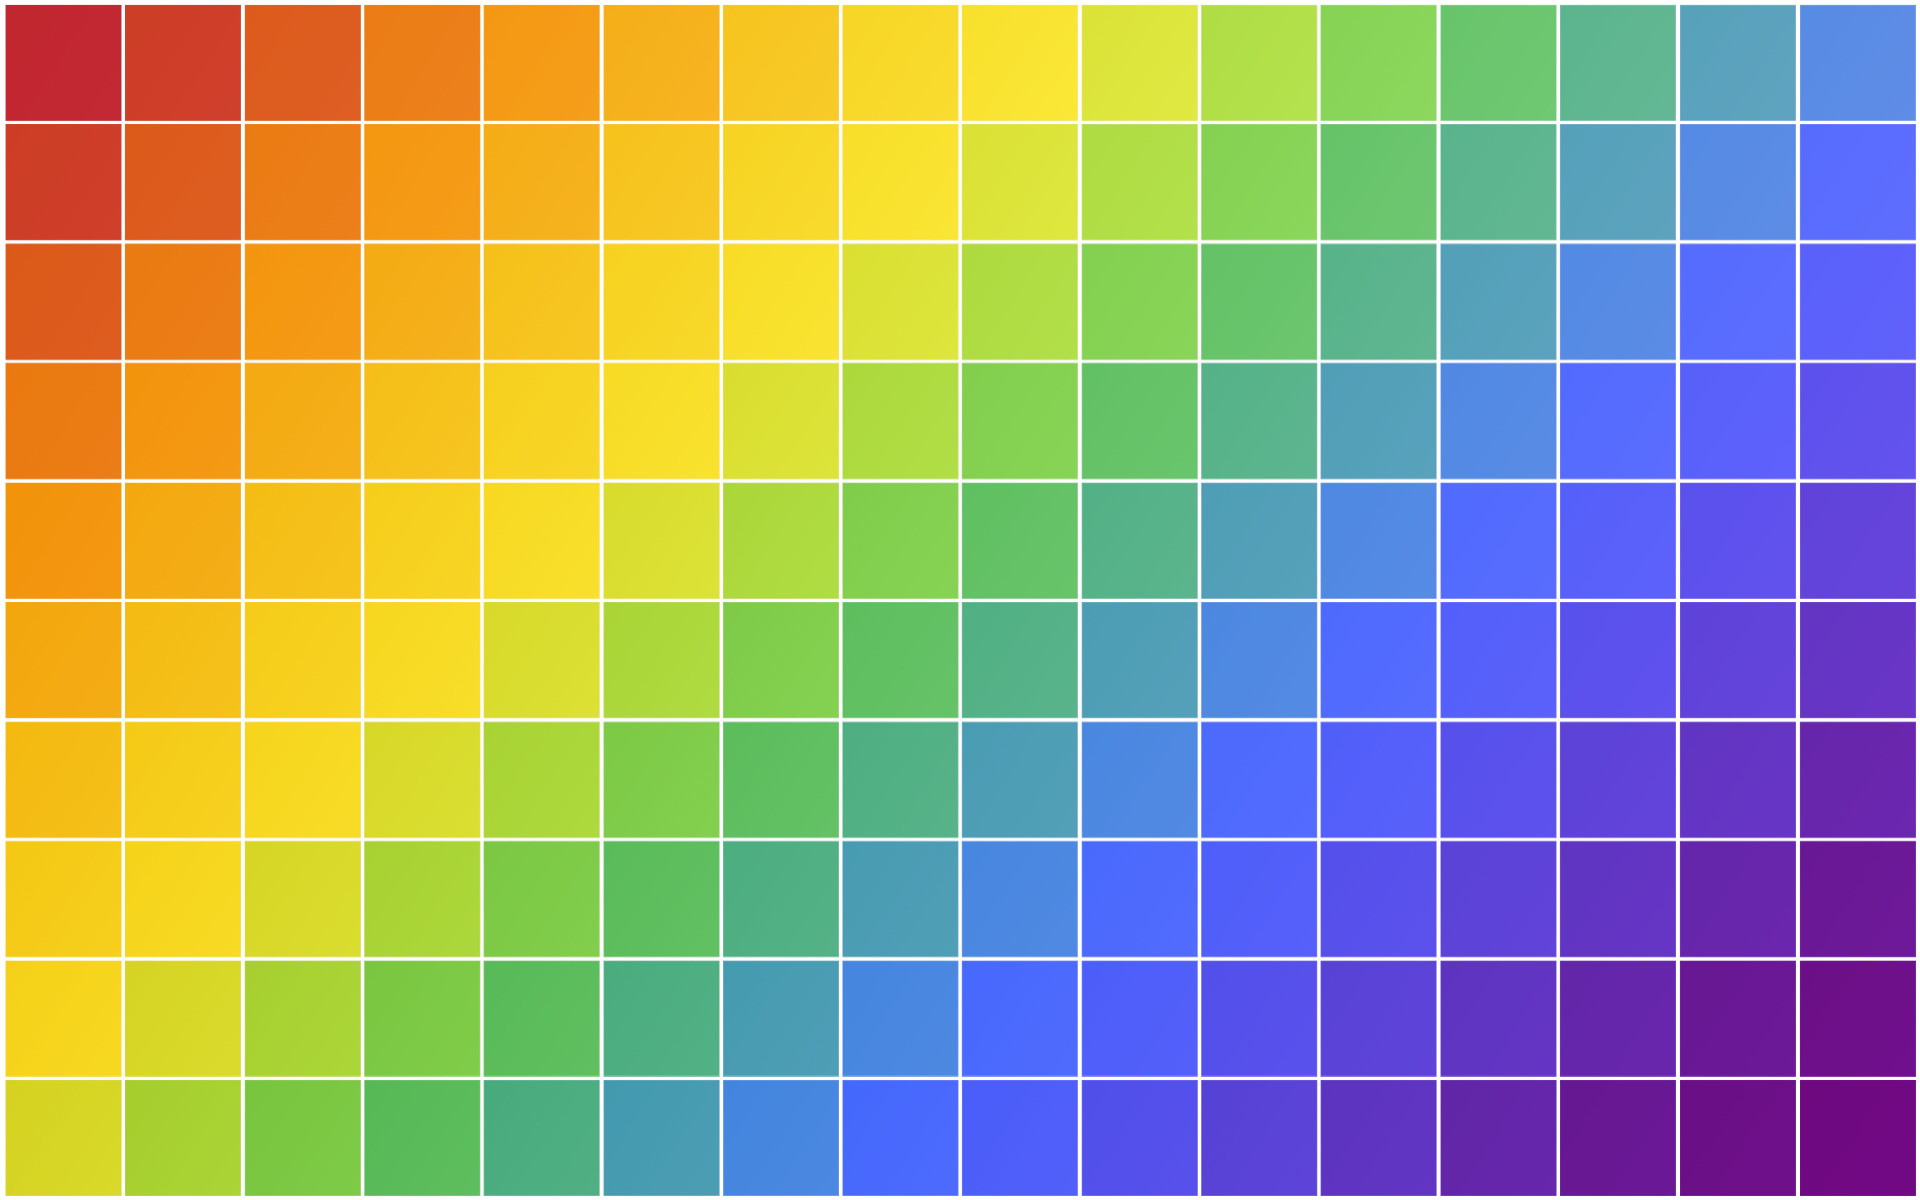 Cool Rainbow Wallpaper 45361 px